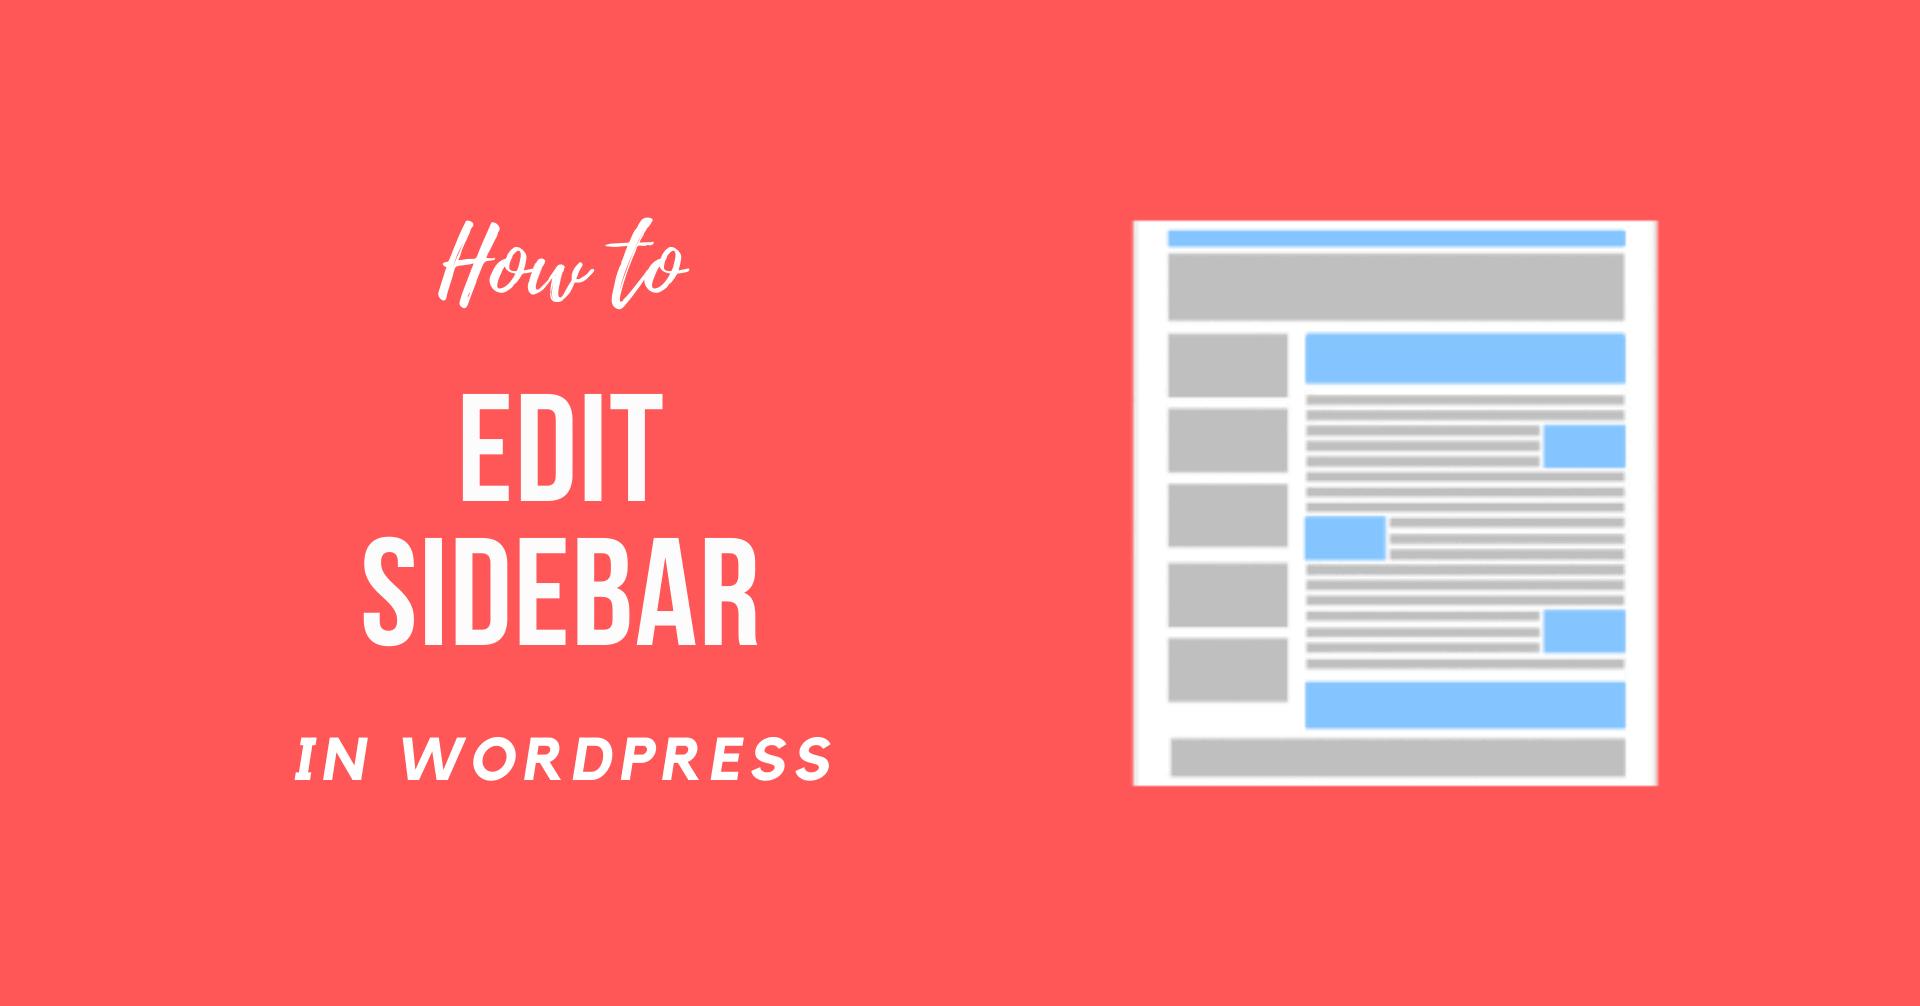 How to Edit Sidebar in WordPress